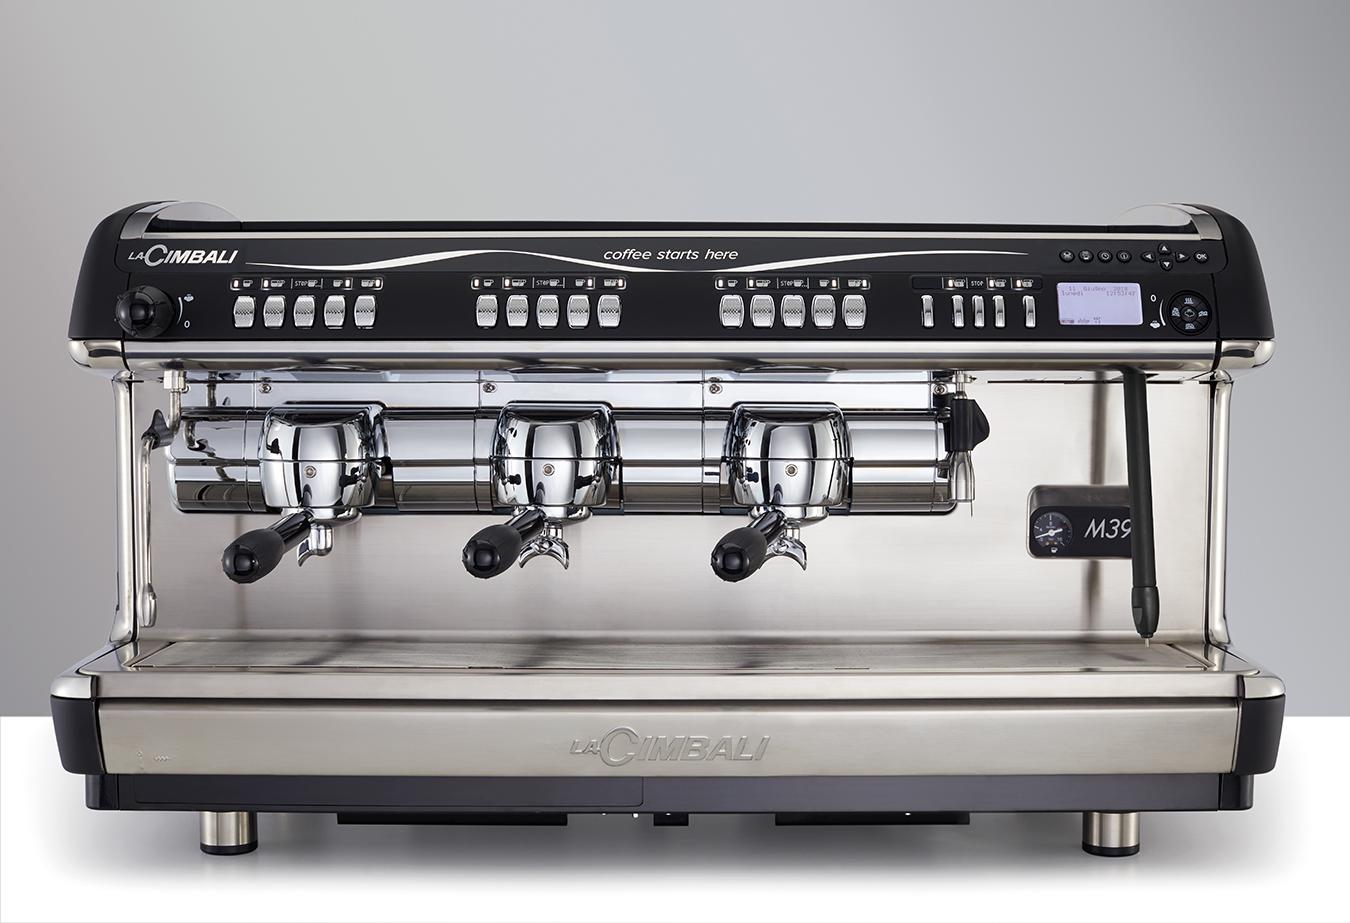 LaCimbali金巴利咖啡机M39RE